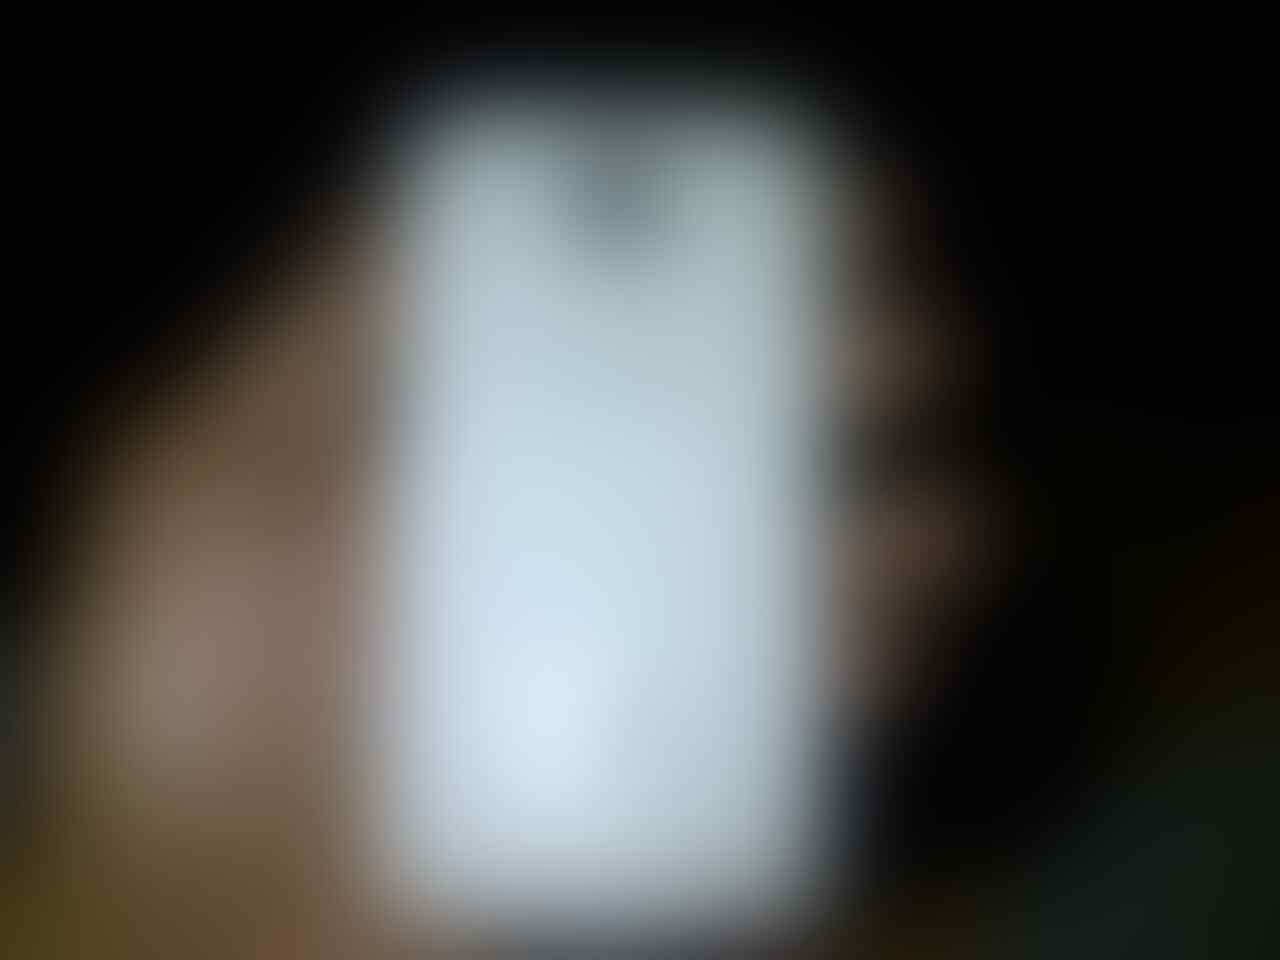 SAMSUNG GALAXY S2 LTE DOCOMO WHITE